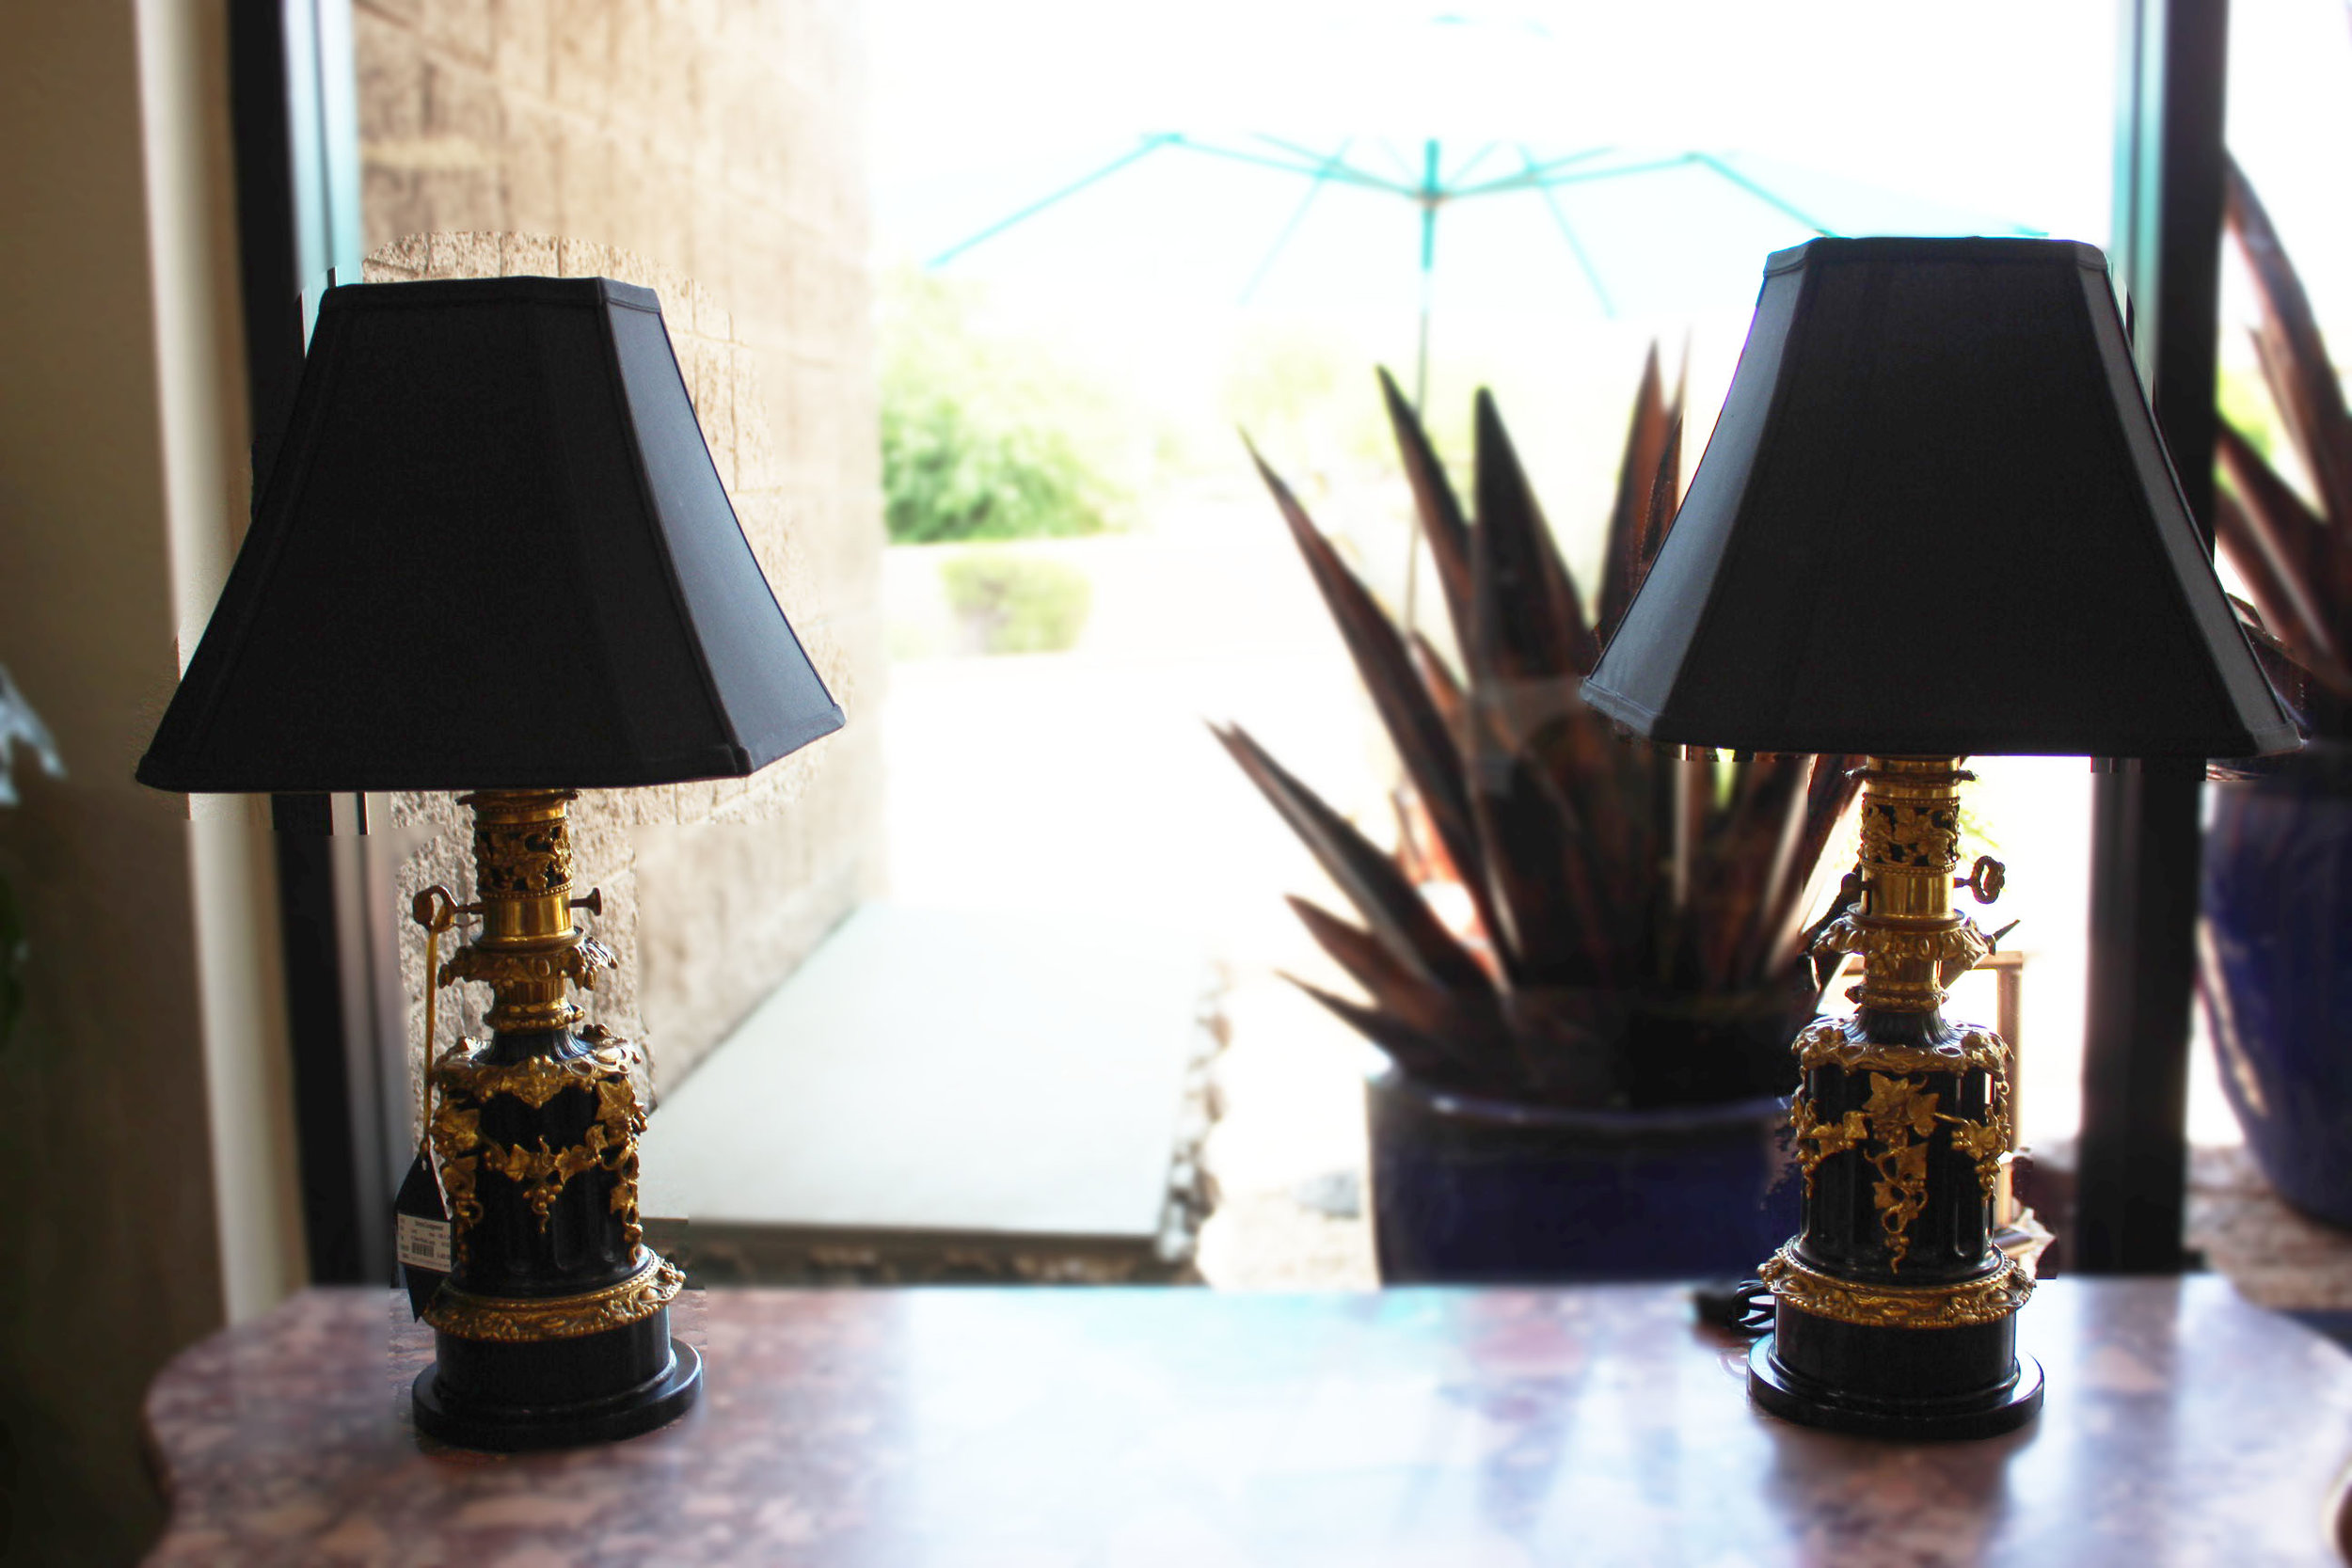 Pair of Black Ormolu Lamps